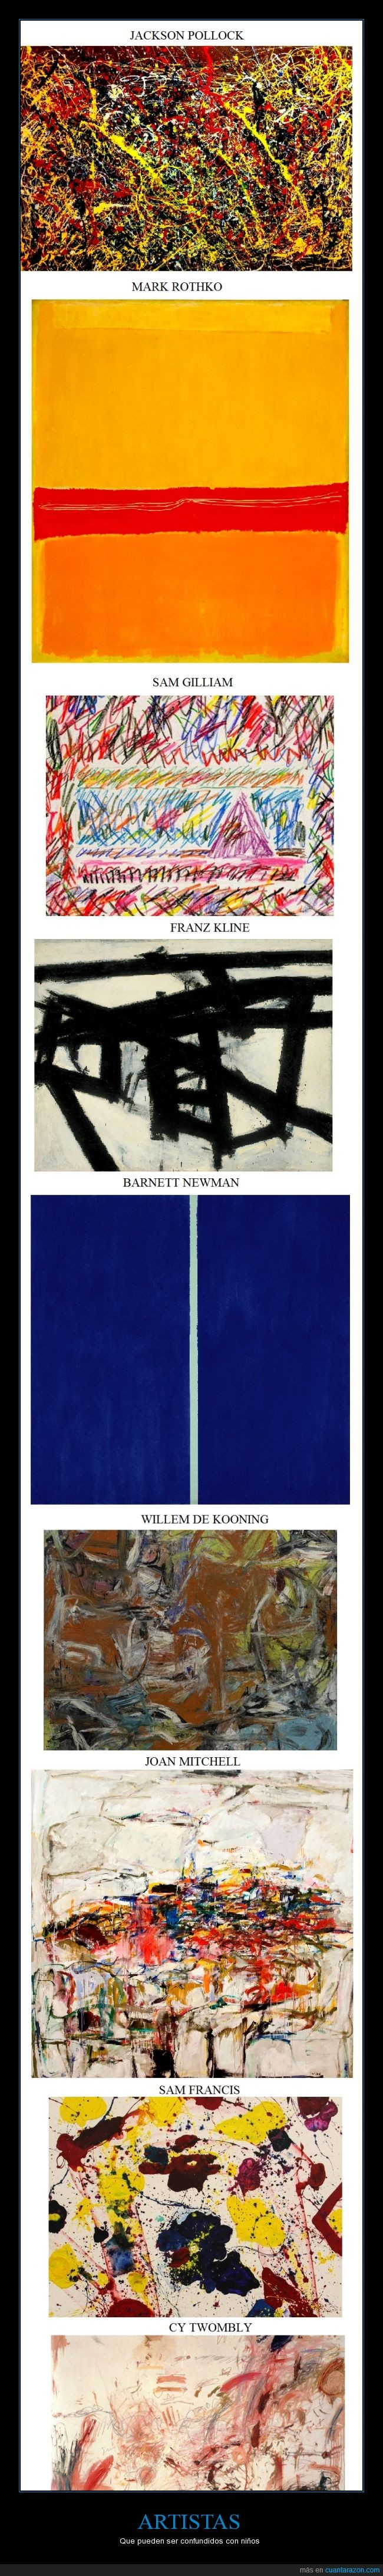 arte contemporaneo,de kooning,gilliam,kline,mitchell,newman,pollock,rothko,sam francis,twombly